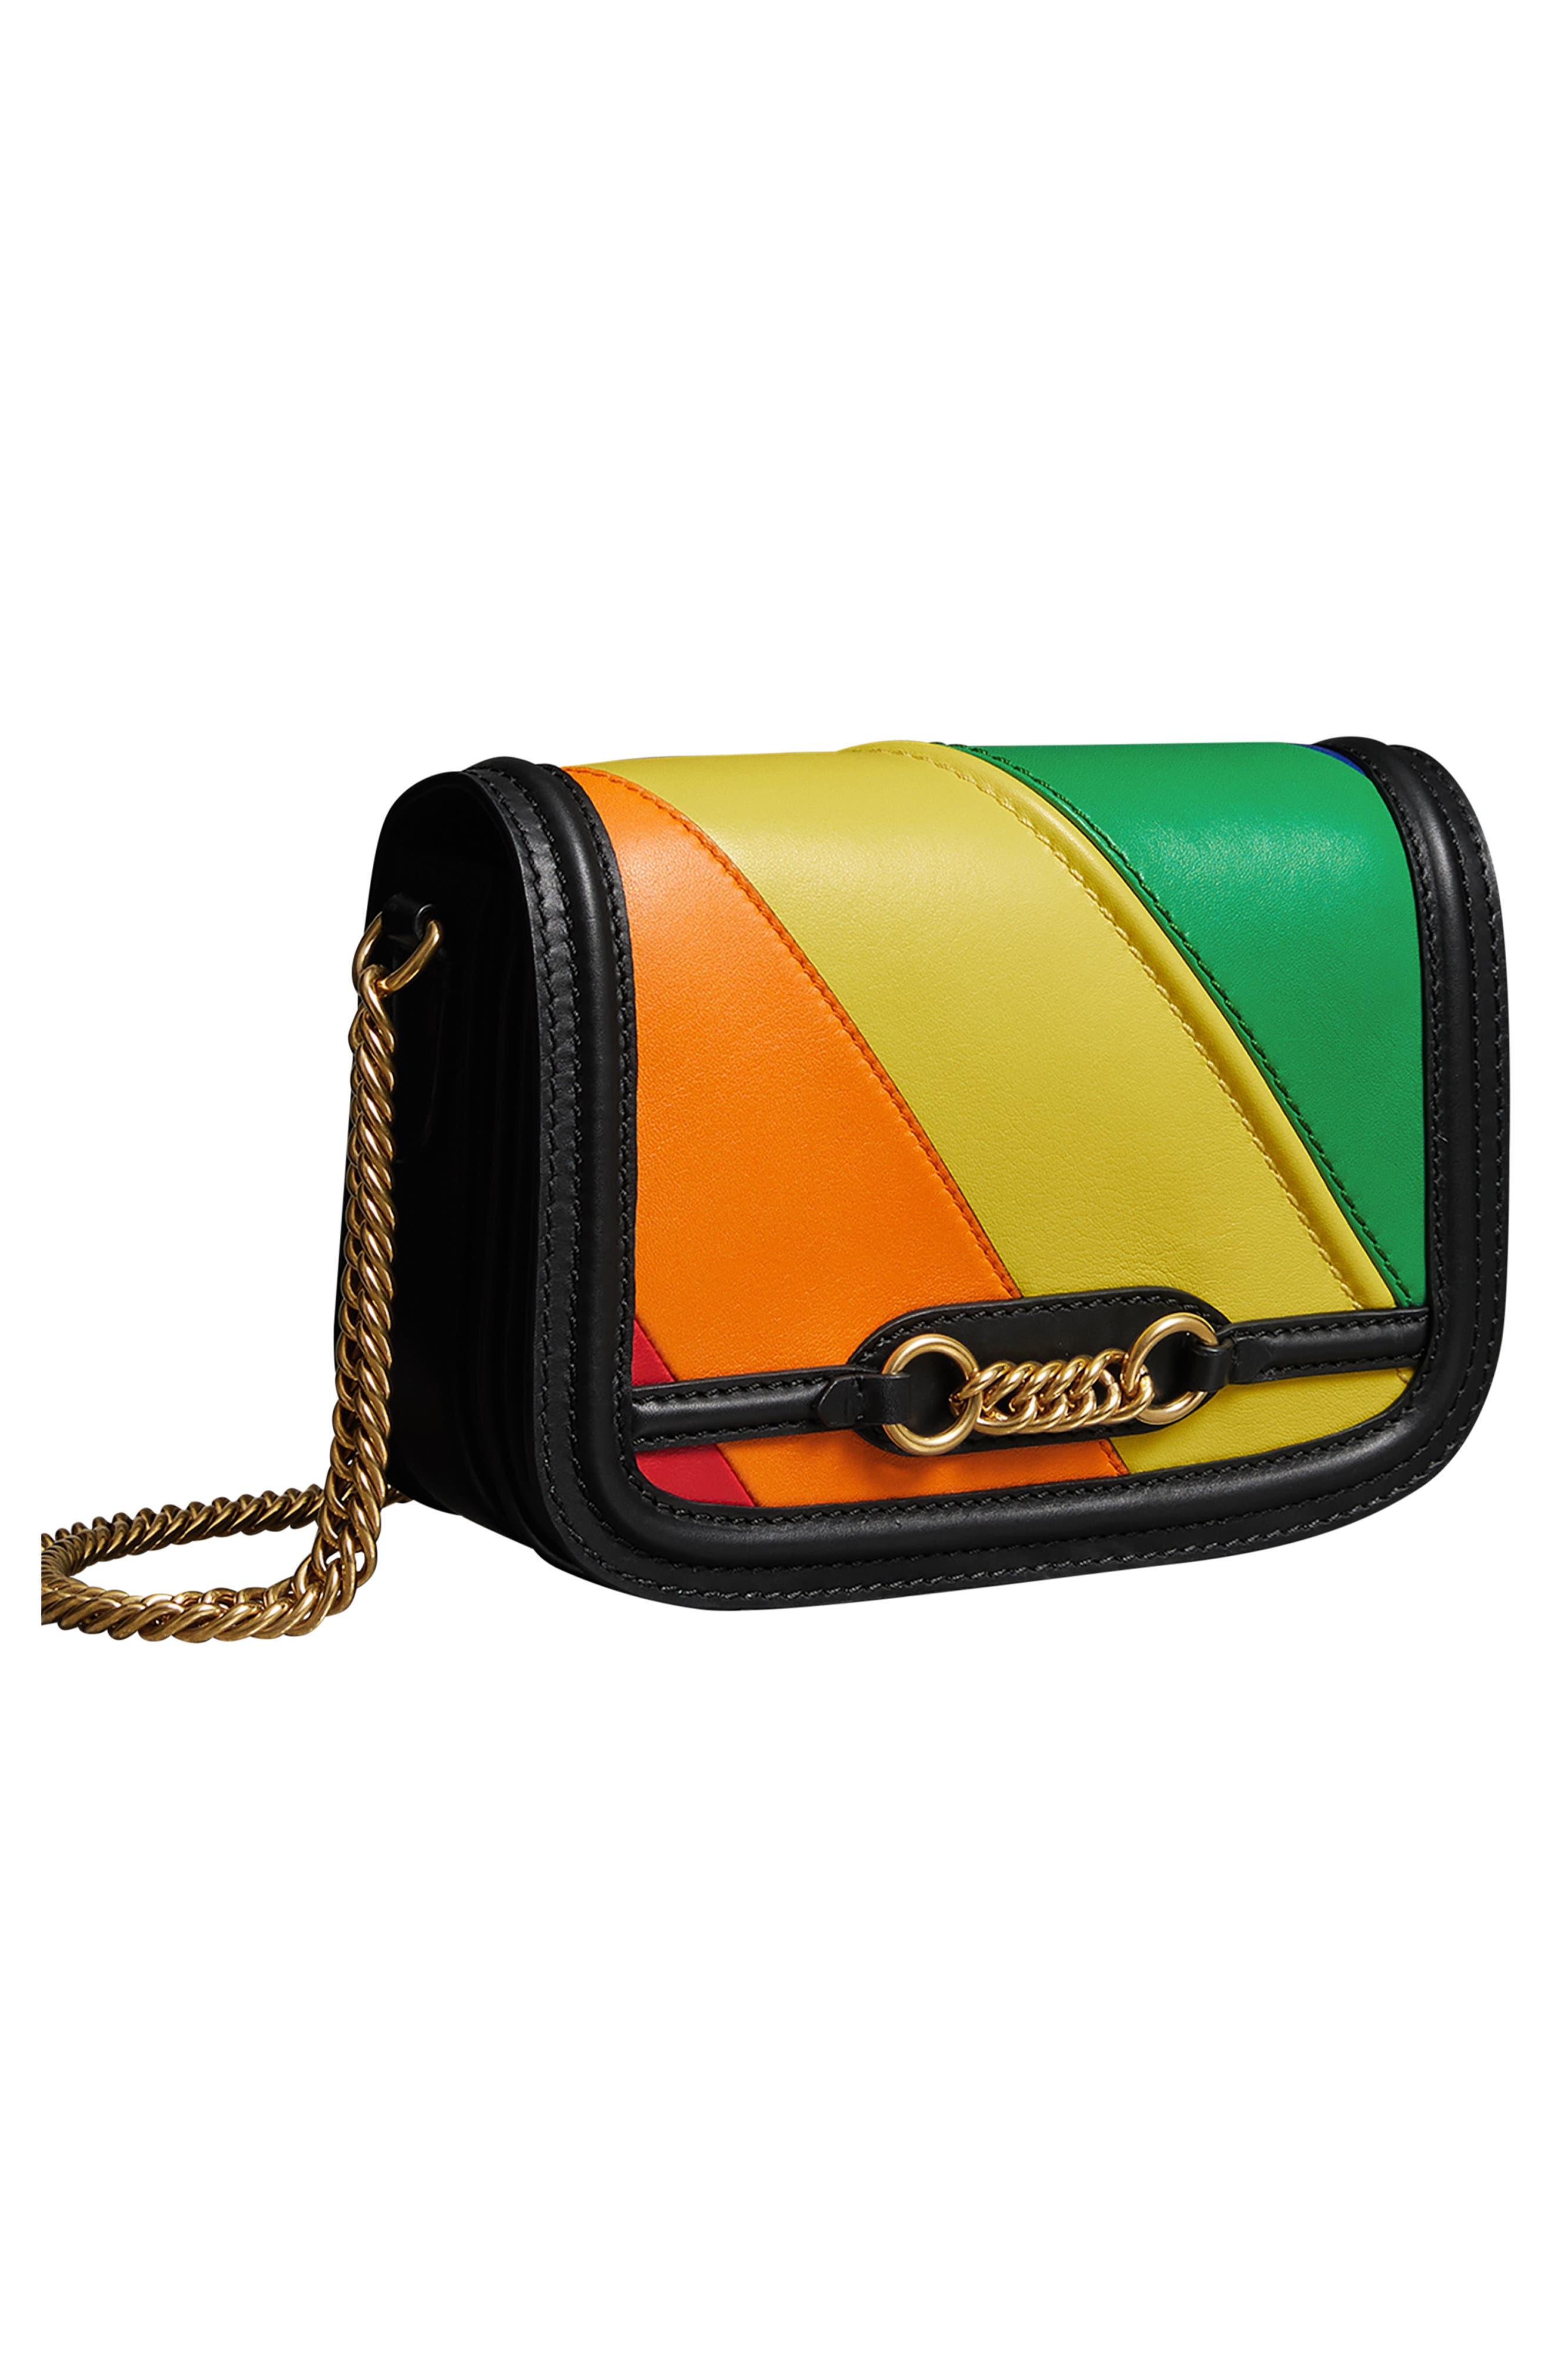 Rainbow Stripe Link Flap Leather Crossbody Bag,                             Alternate thumbnail 4, color,                             001